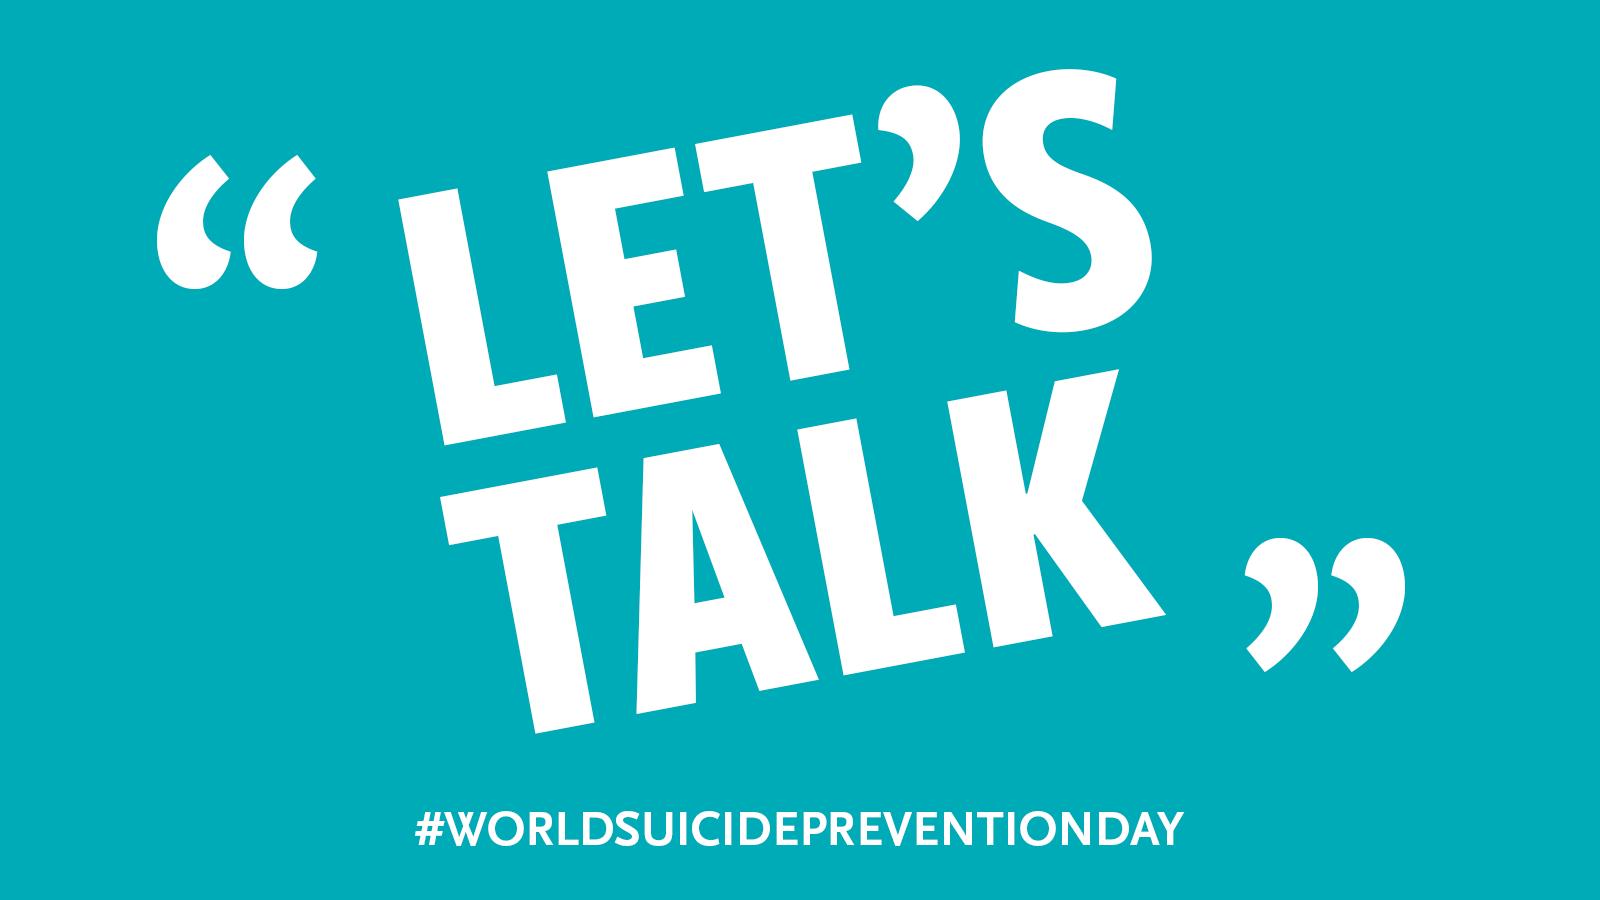 Let's talk. World Suicide Prevention Month